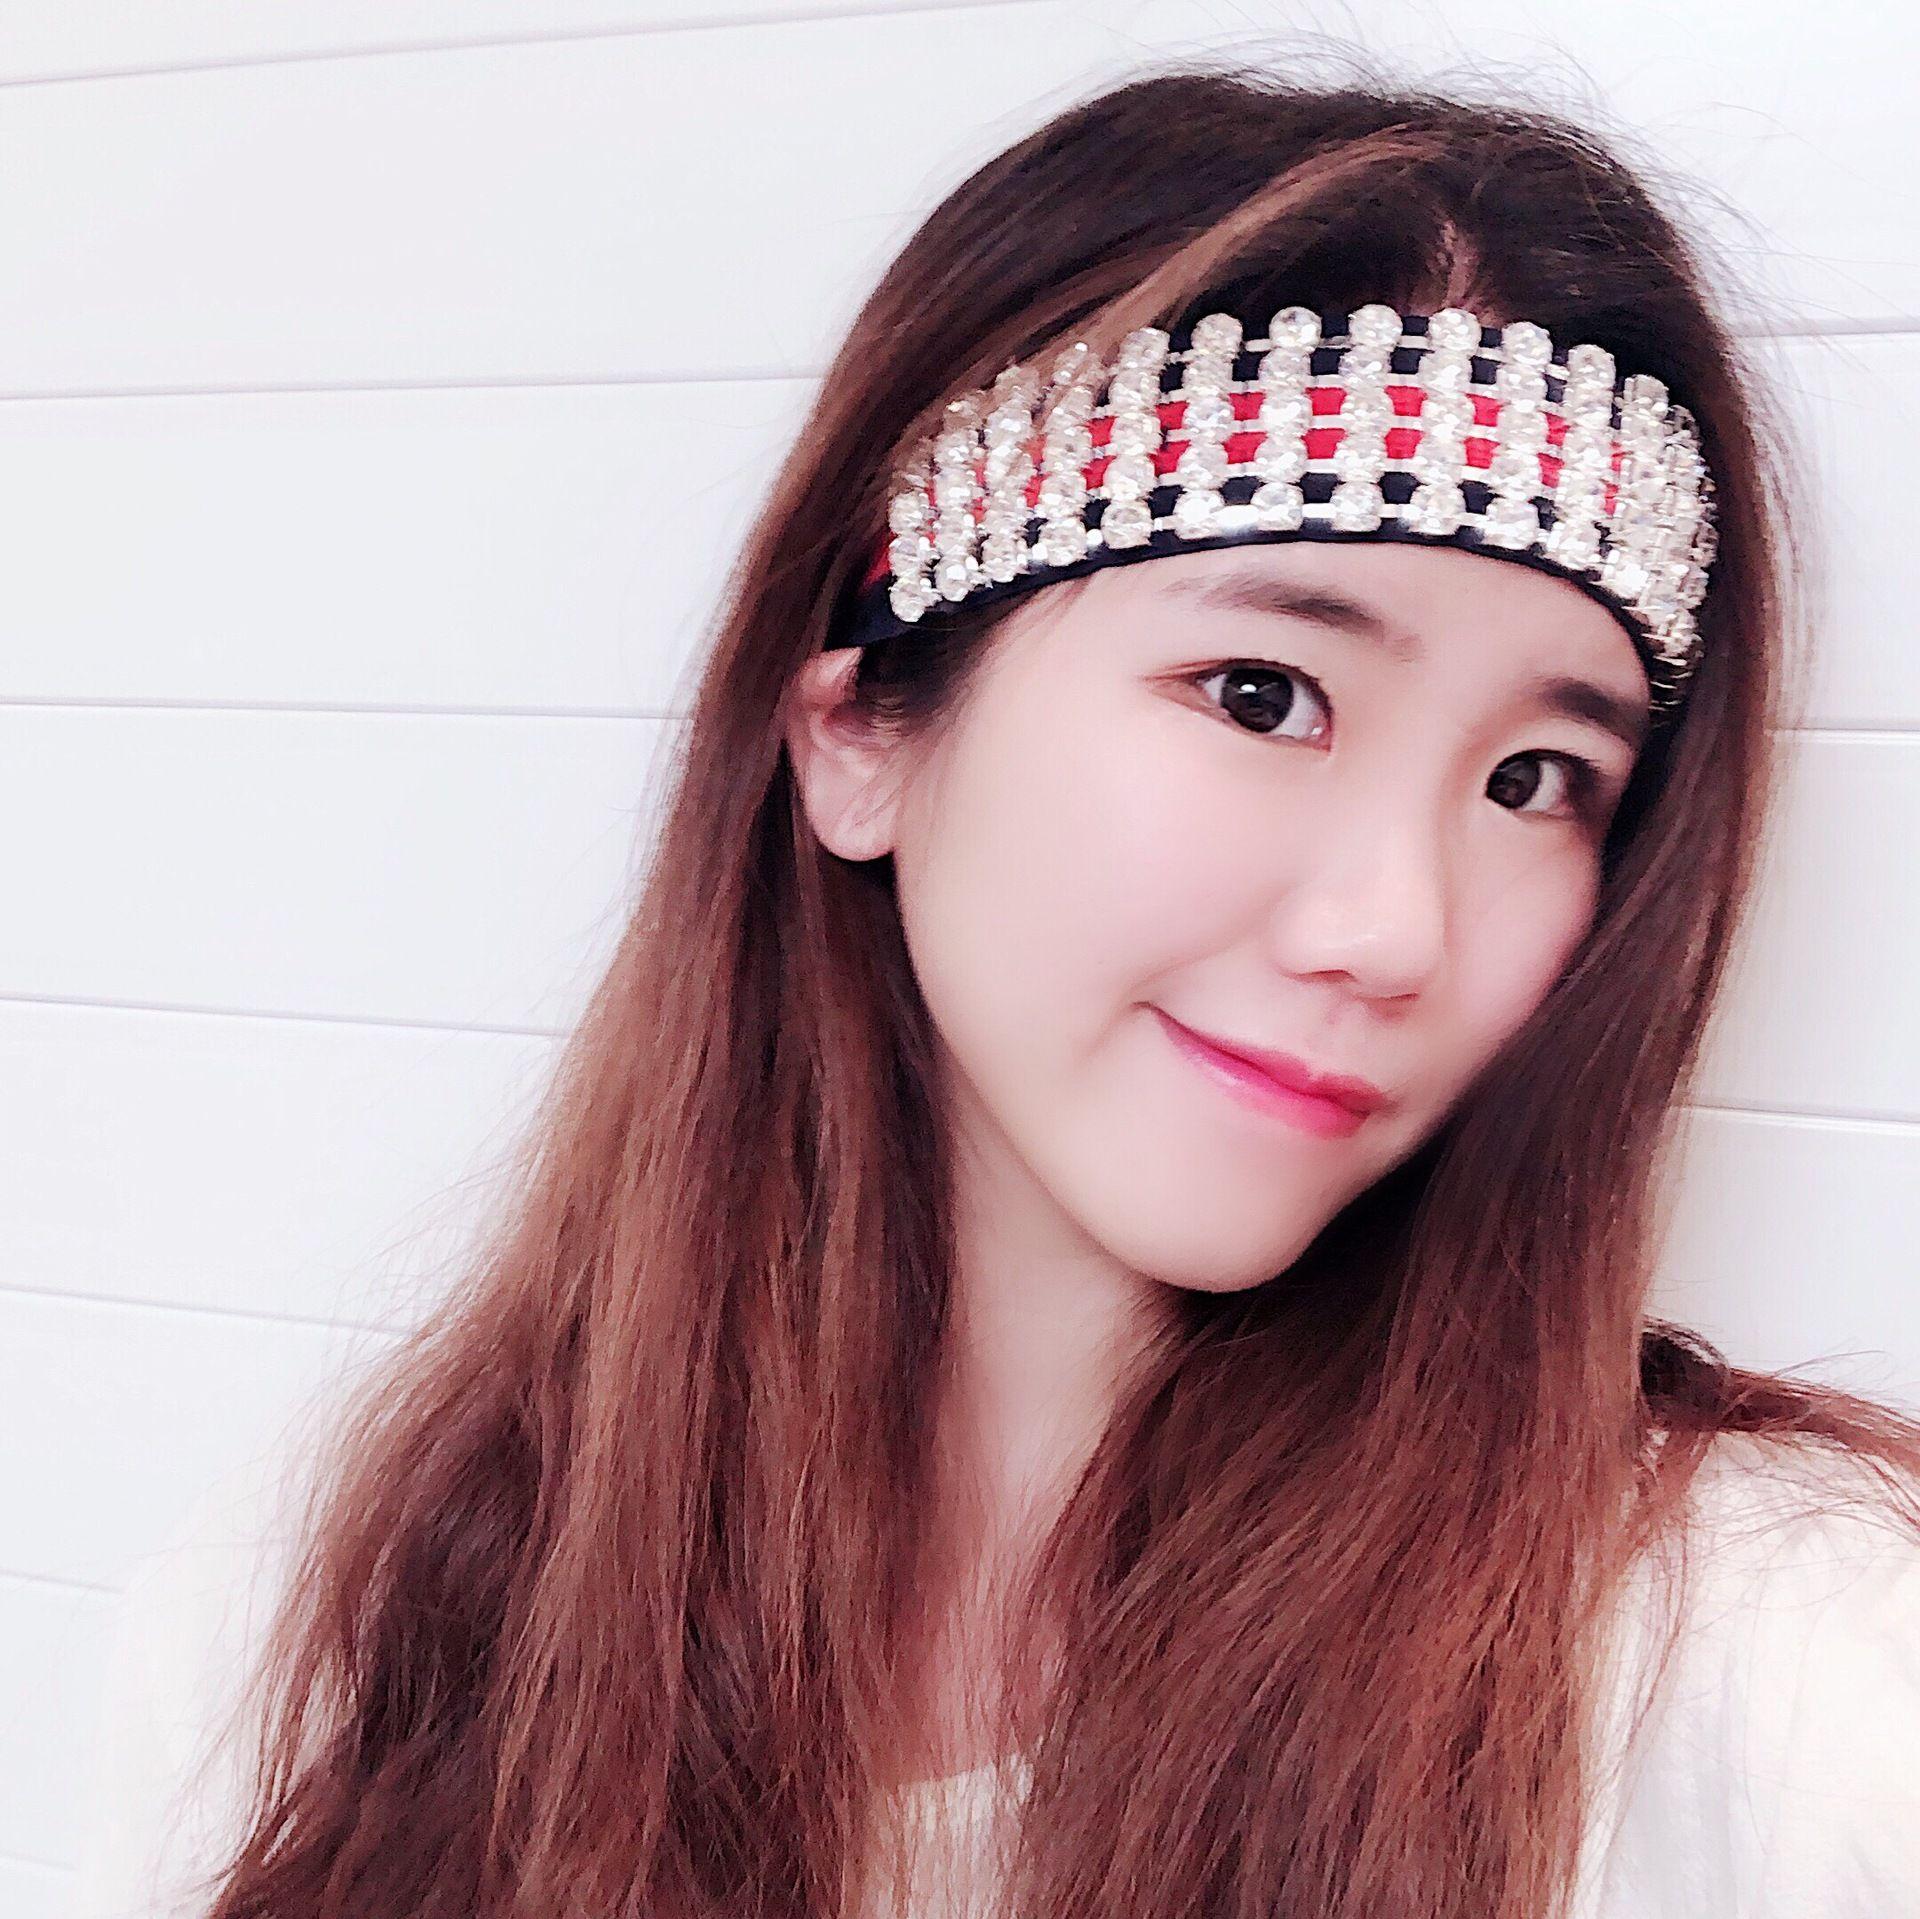 2019 Luxury Diamond Headband Stripe Crystal Head Band Runway Headwrap Sport  Fashion Gift Rhinestones Elastic Hair Belt Accessaries For Women Girl From  ... 240f781c5cf